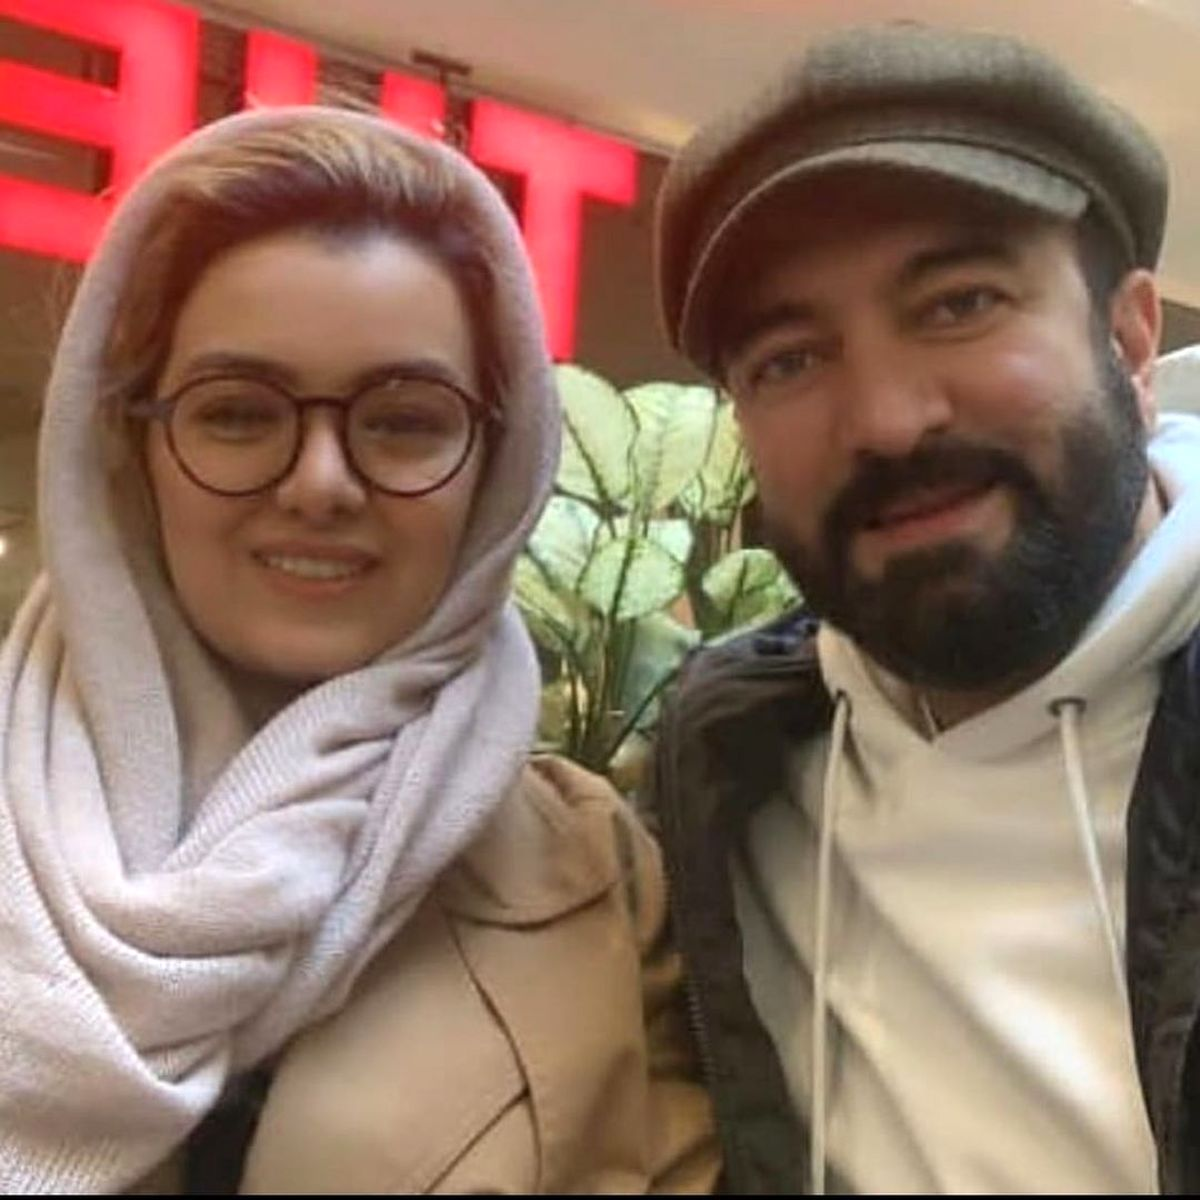 مجید صالحی: همسرم پرستار مادرم نبود! +عکس